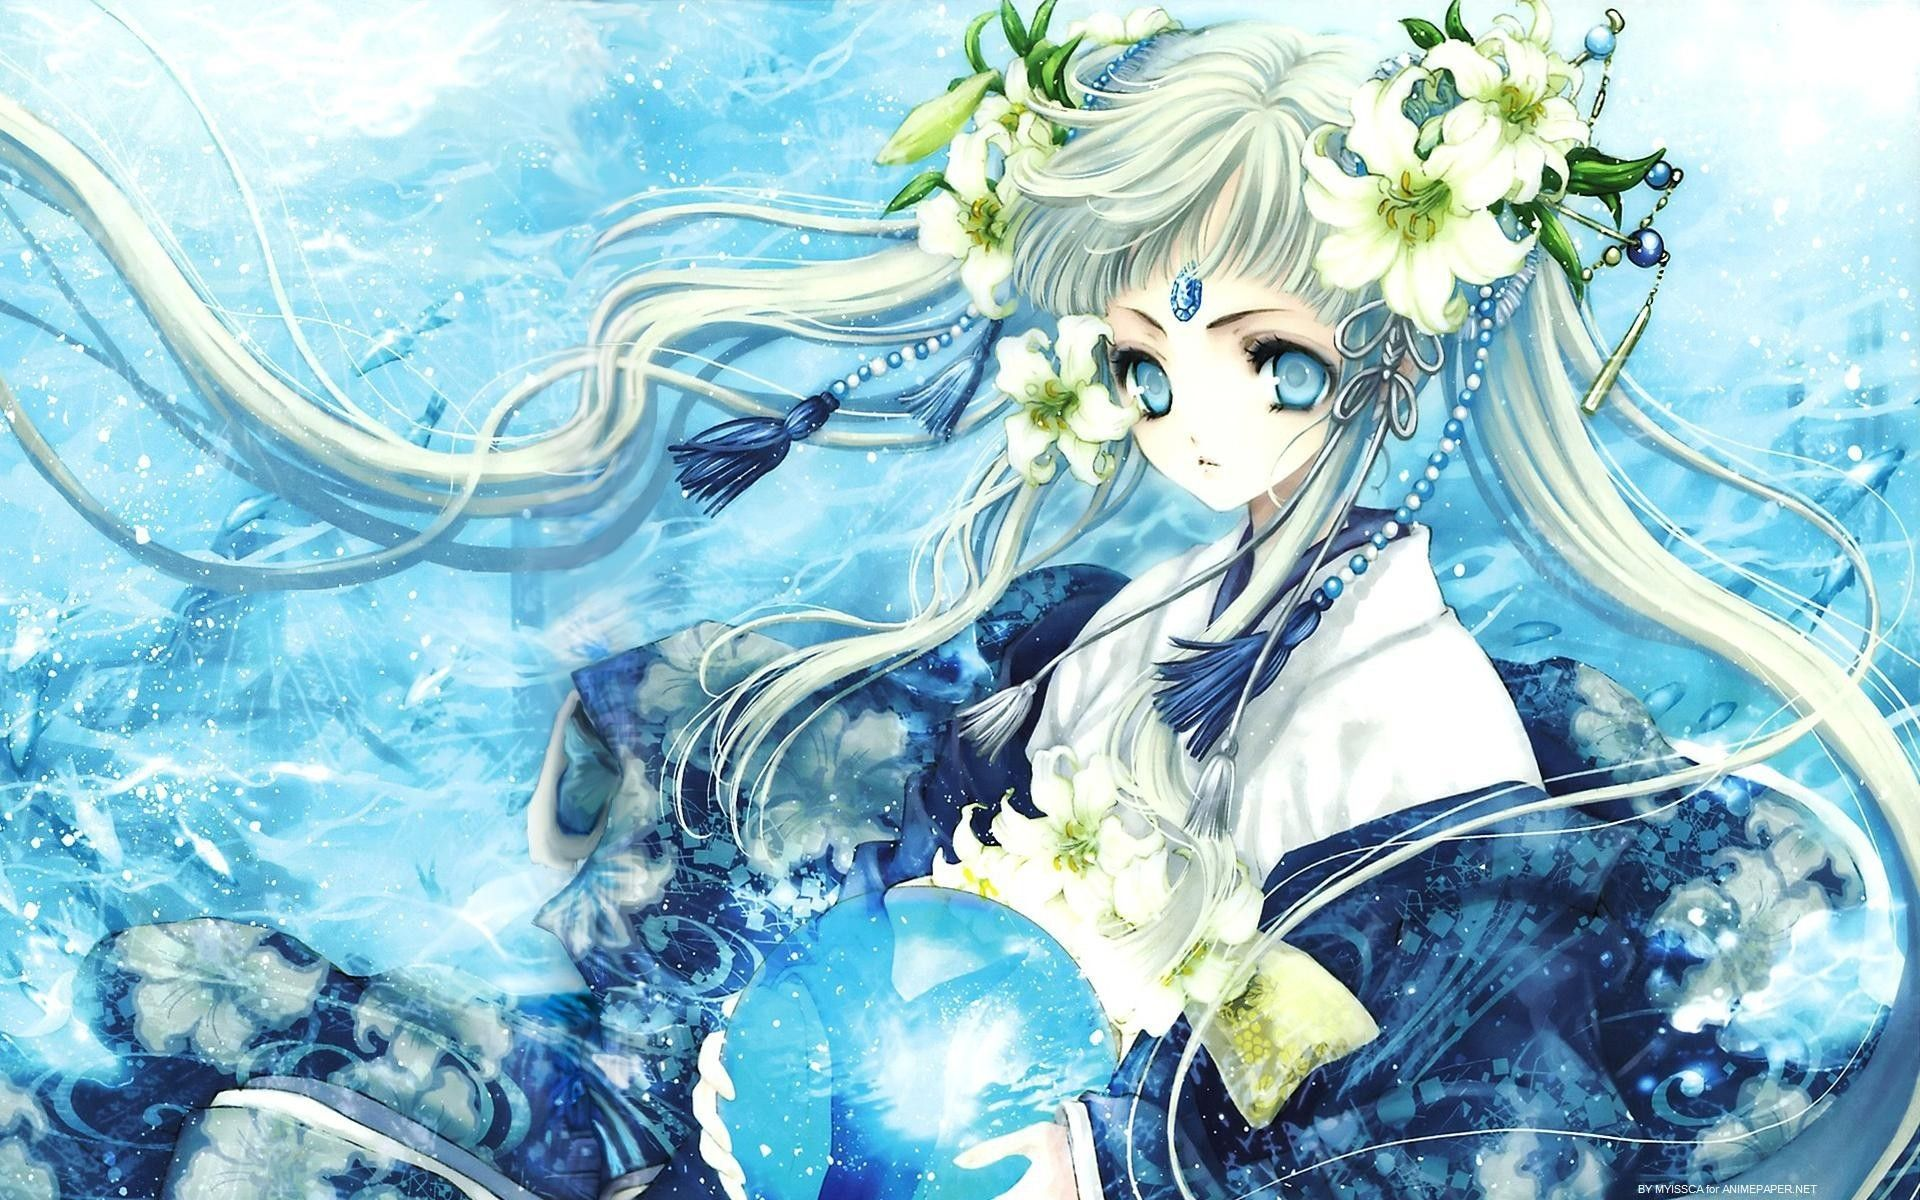 Anime Goddess Wallpapers Top Free Anime Goddess Backgrounds Wallpaperaccess